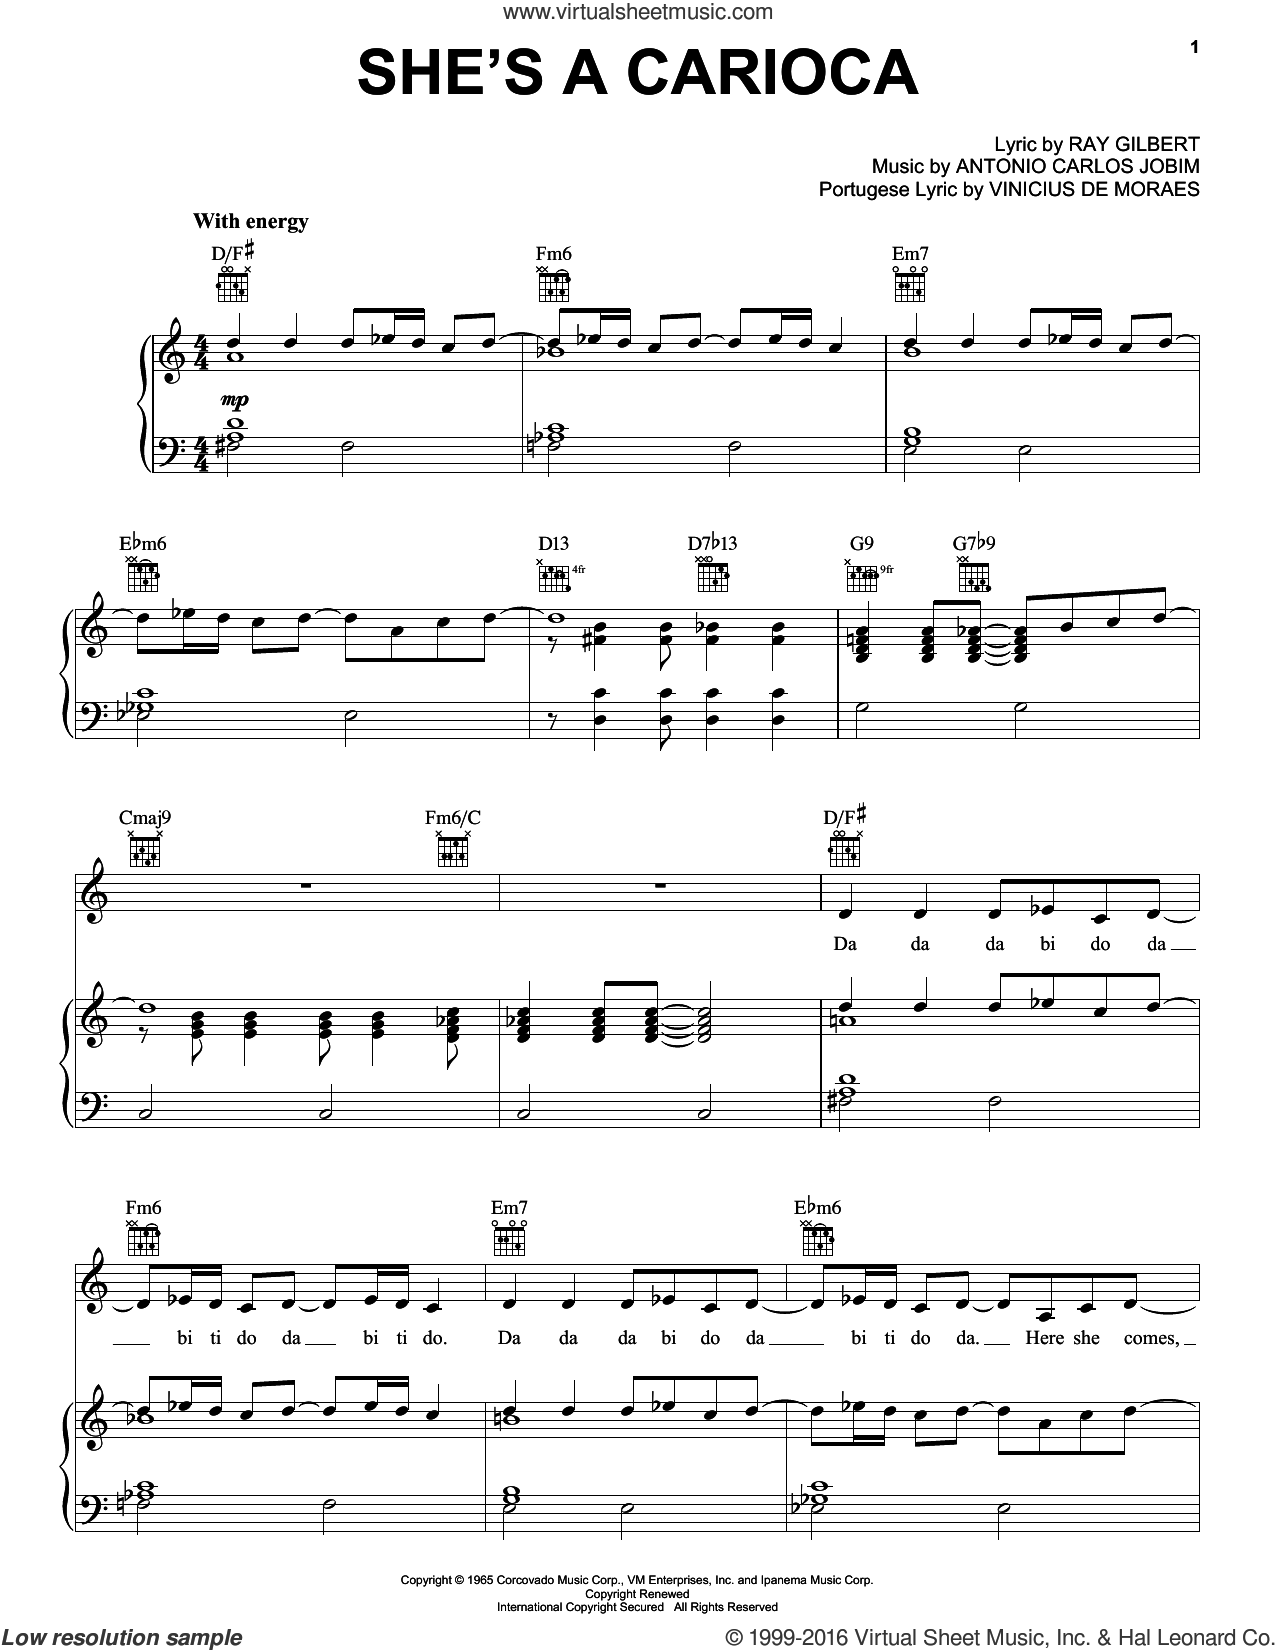 She's A Carioca sheet music for voice, piano or guitar by Antonio Carlos Jobim, Ray Gilbert and Vinicius de Moraes, intermediate skill level